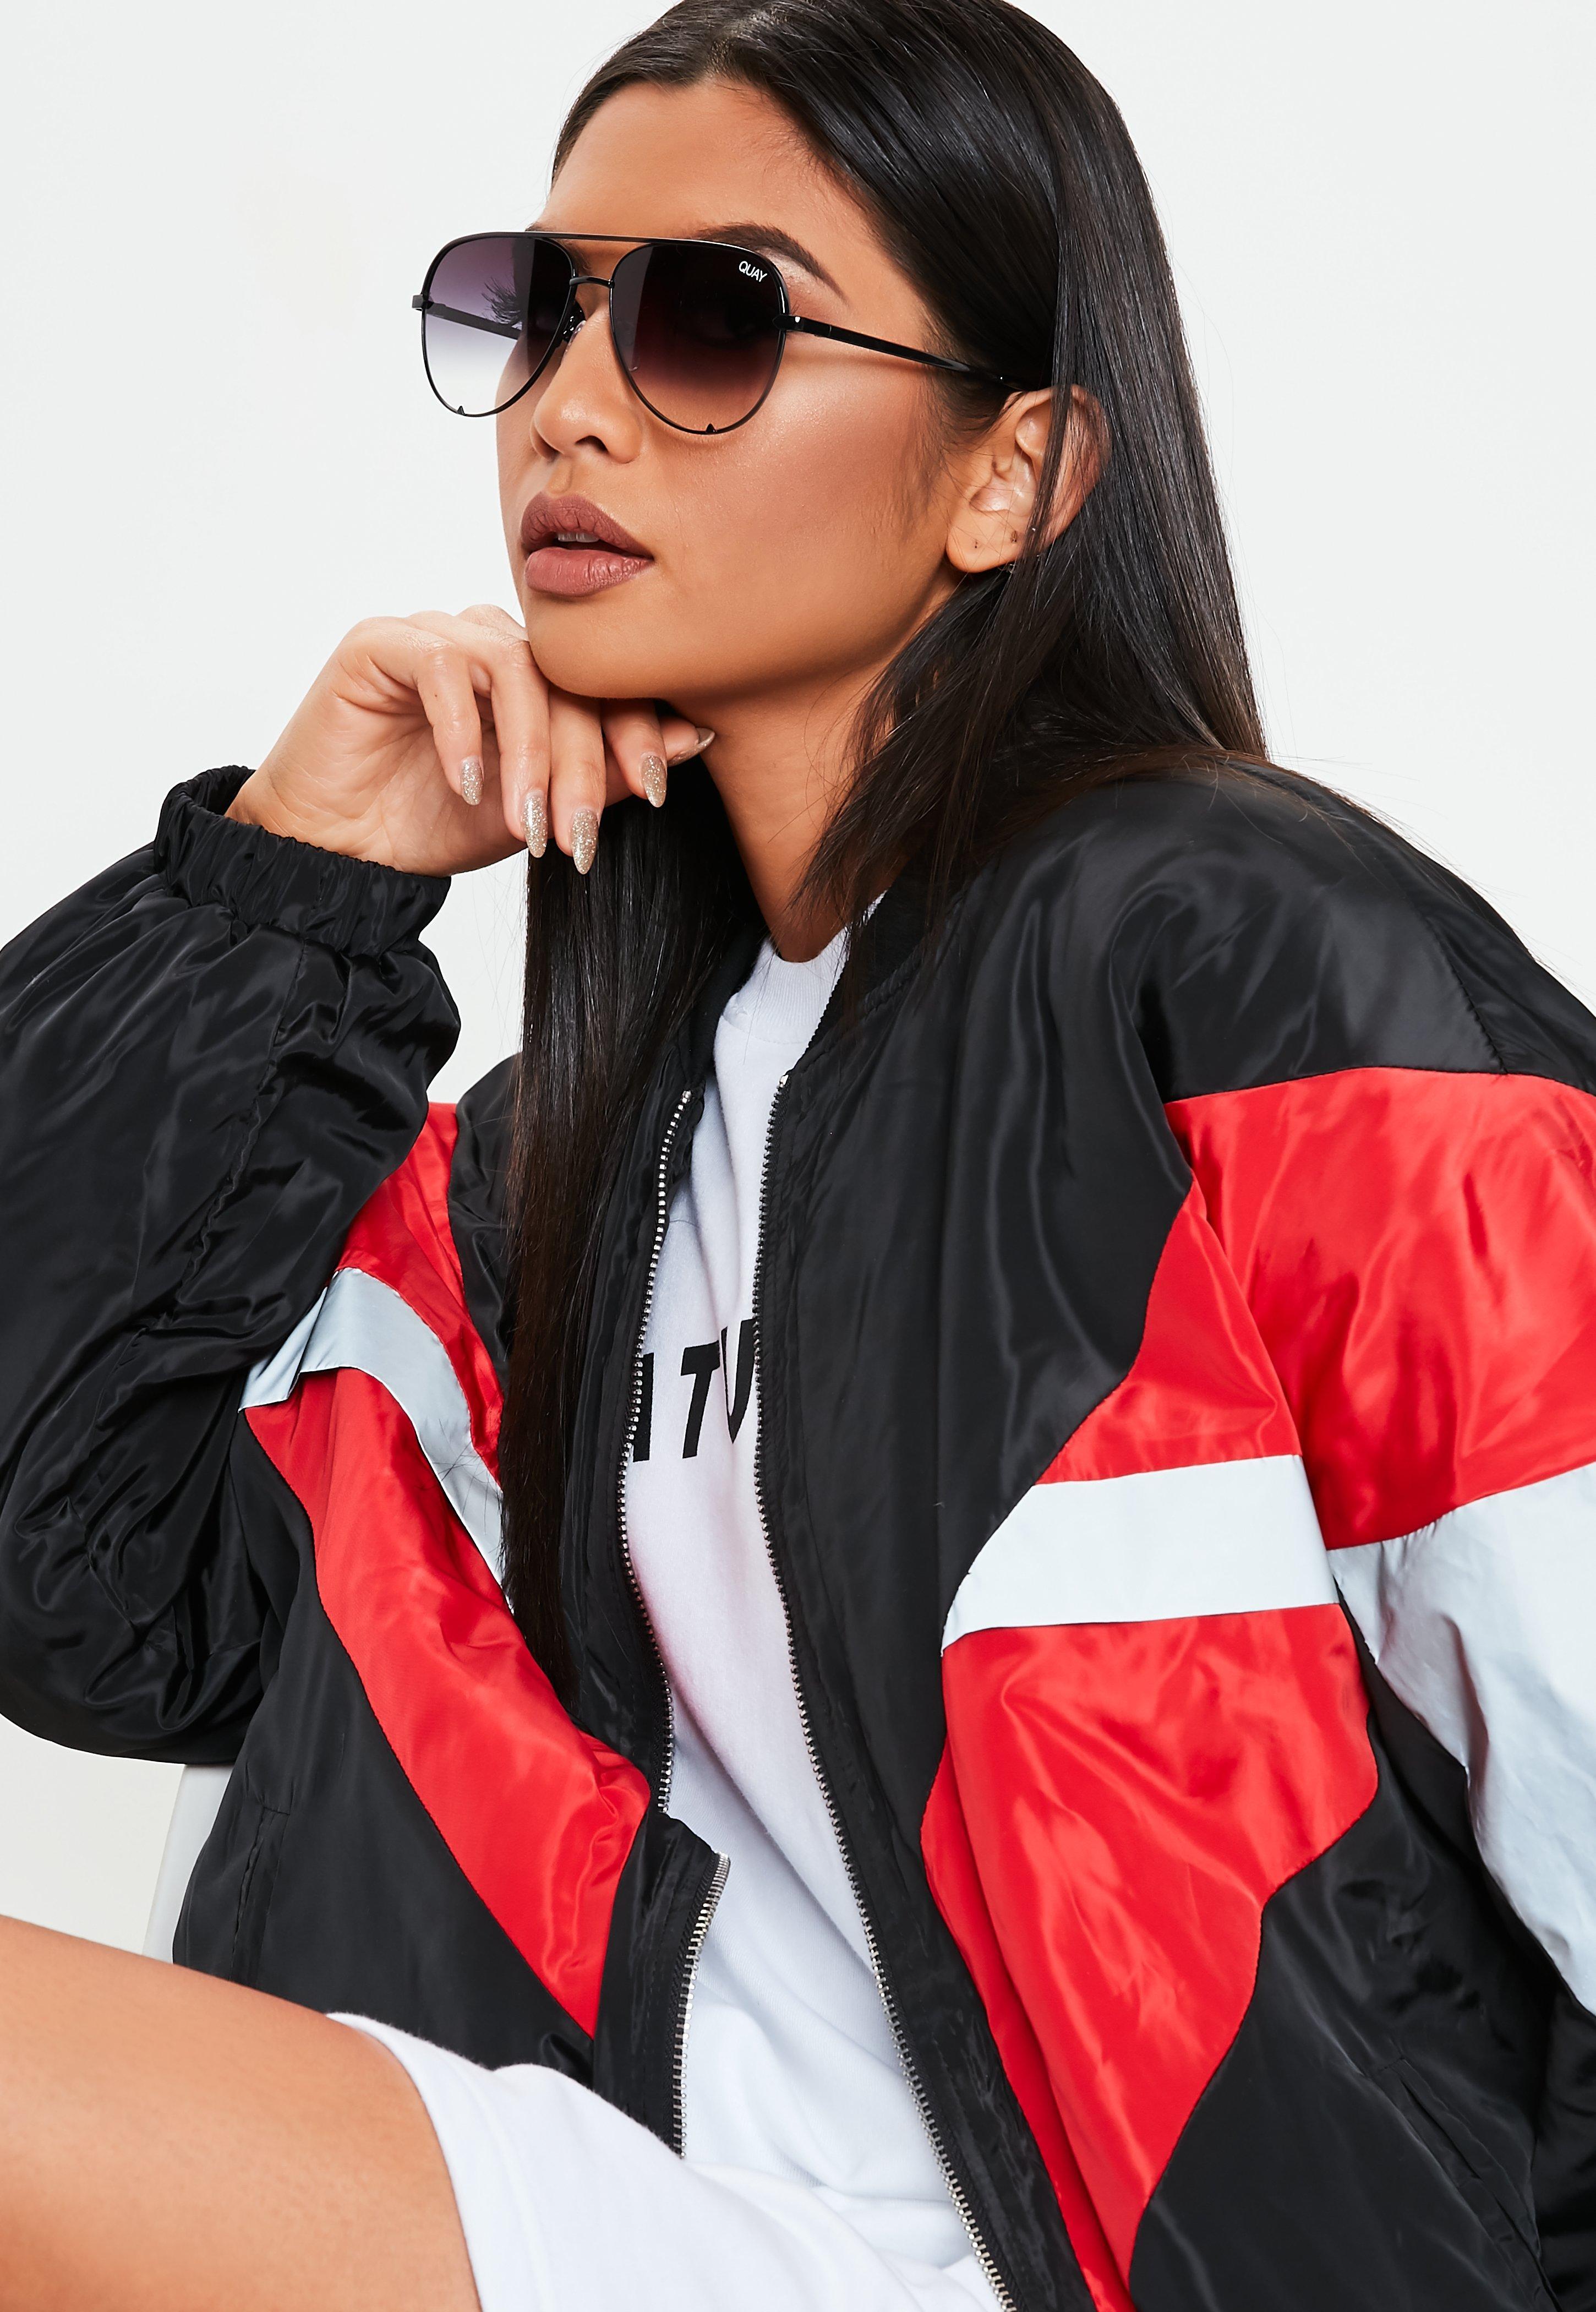 8643759b3af9b Shop Women s Sunglasses Online